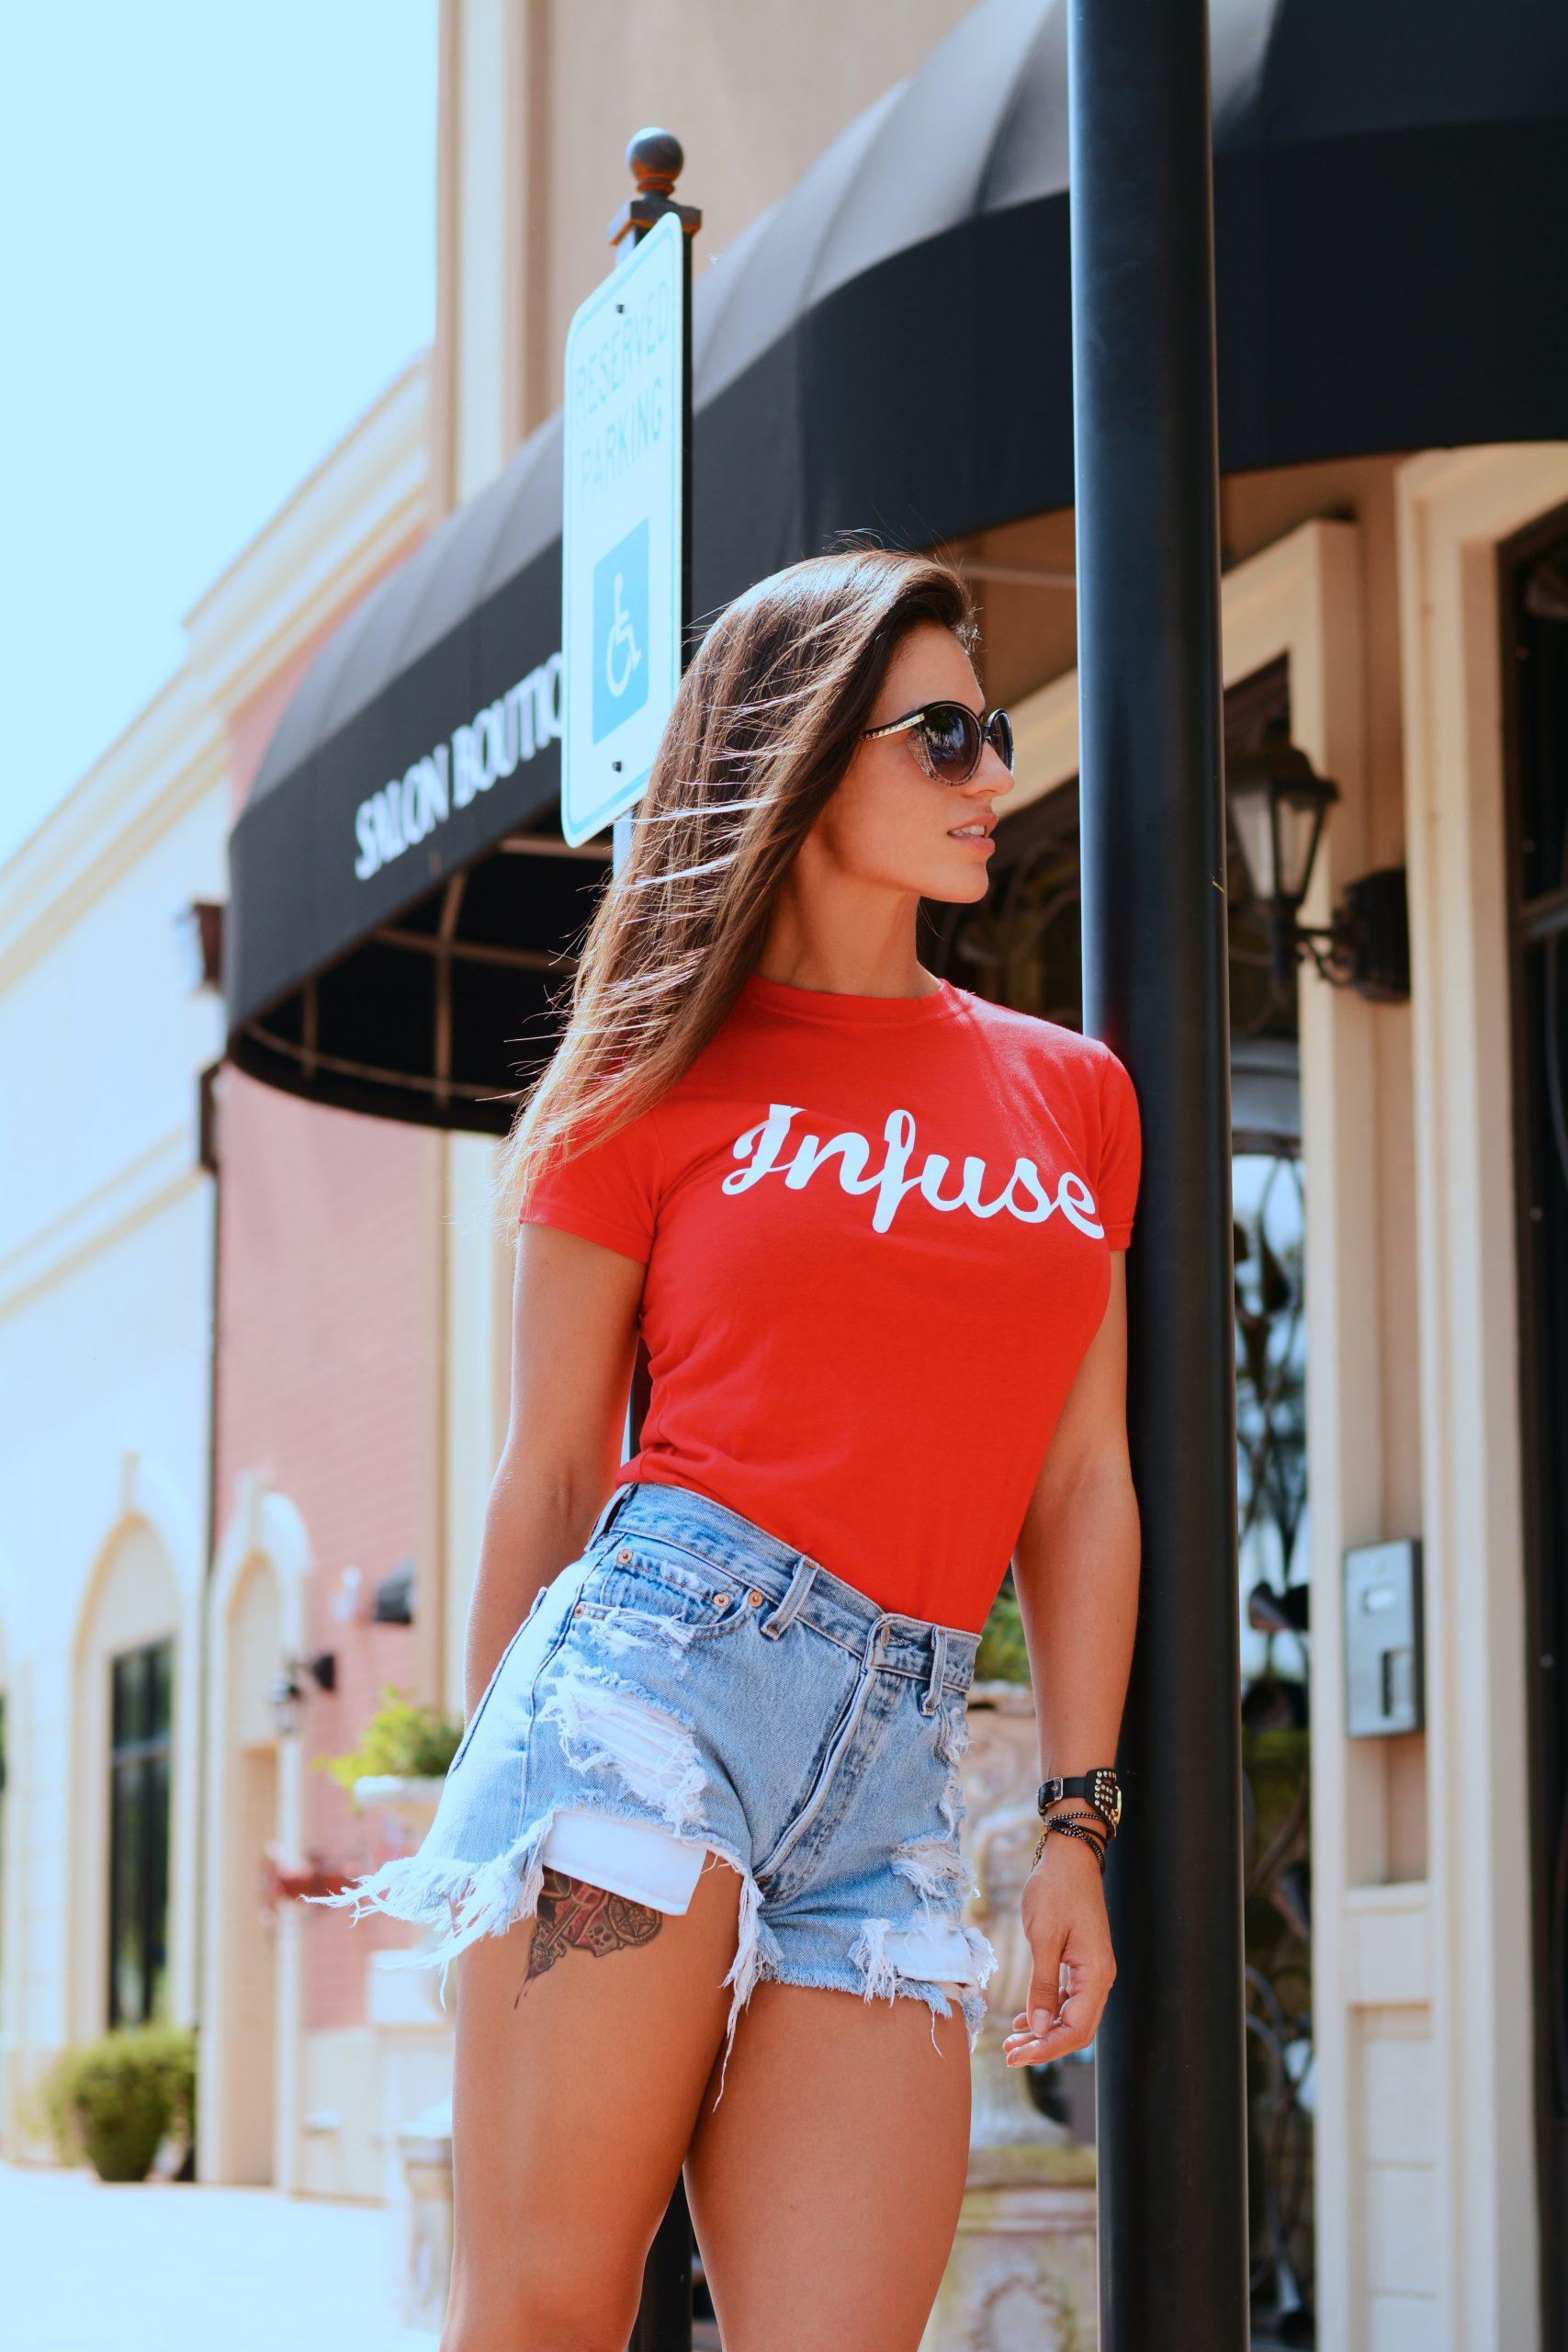 5 Major Fashion Hacks For An Amazing Summer